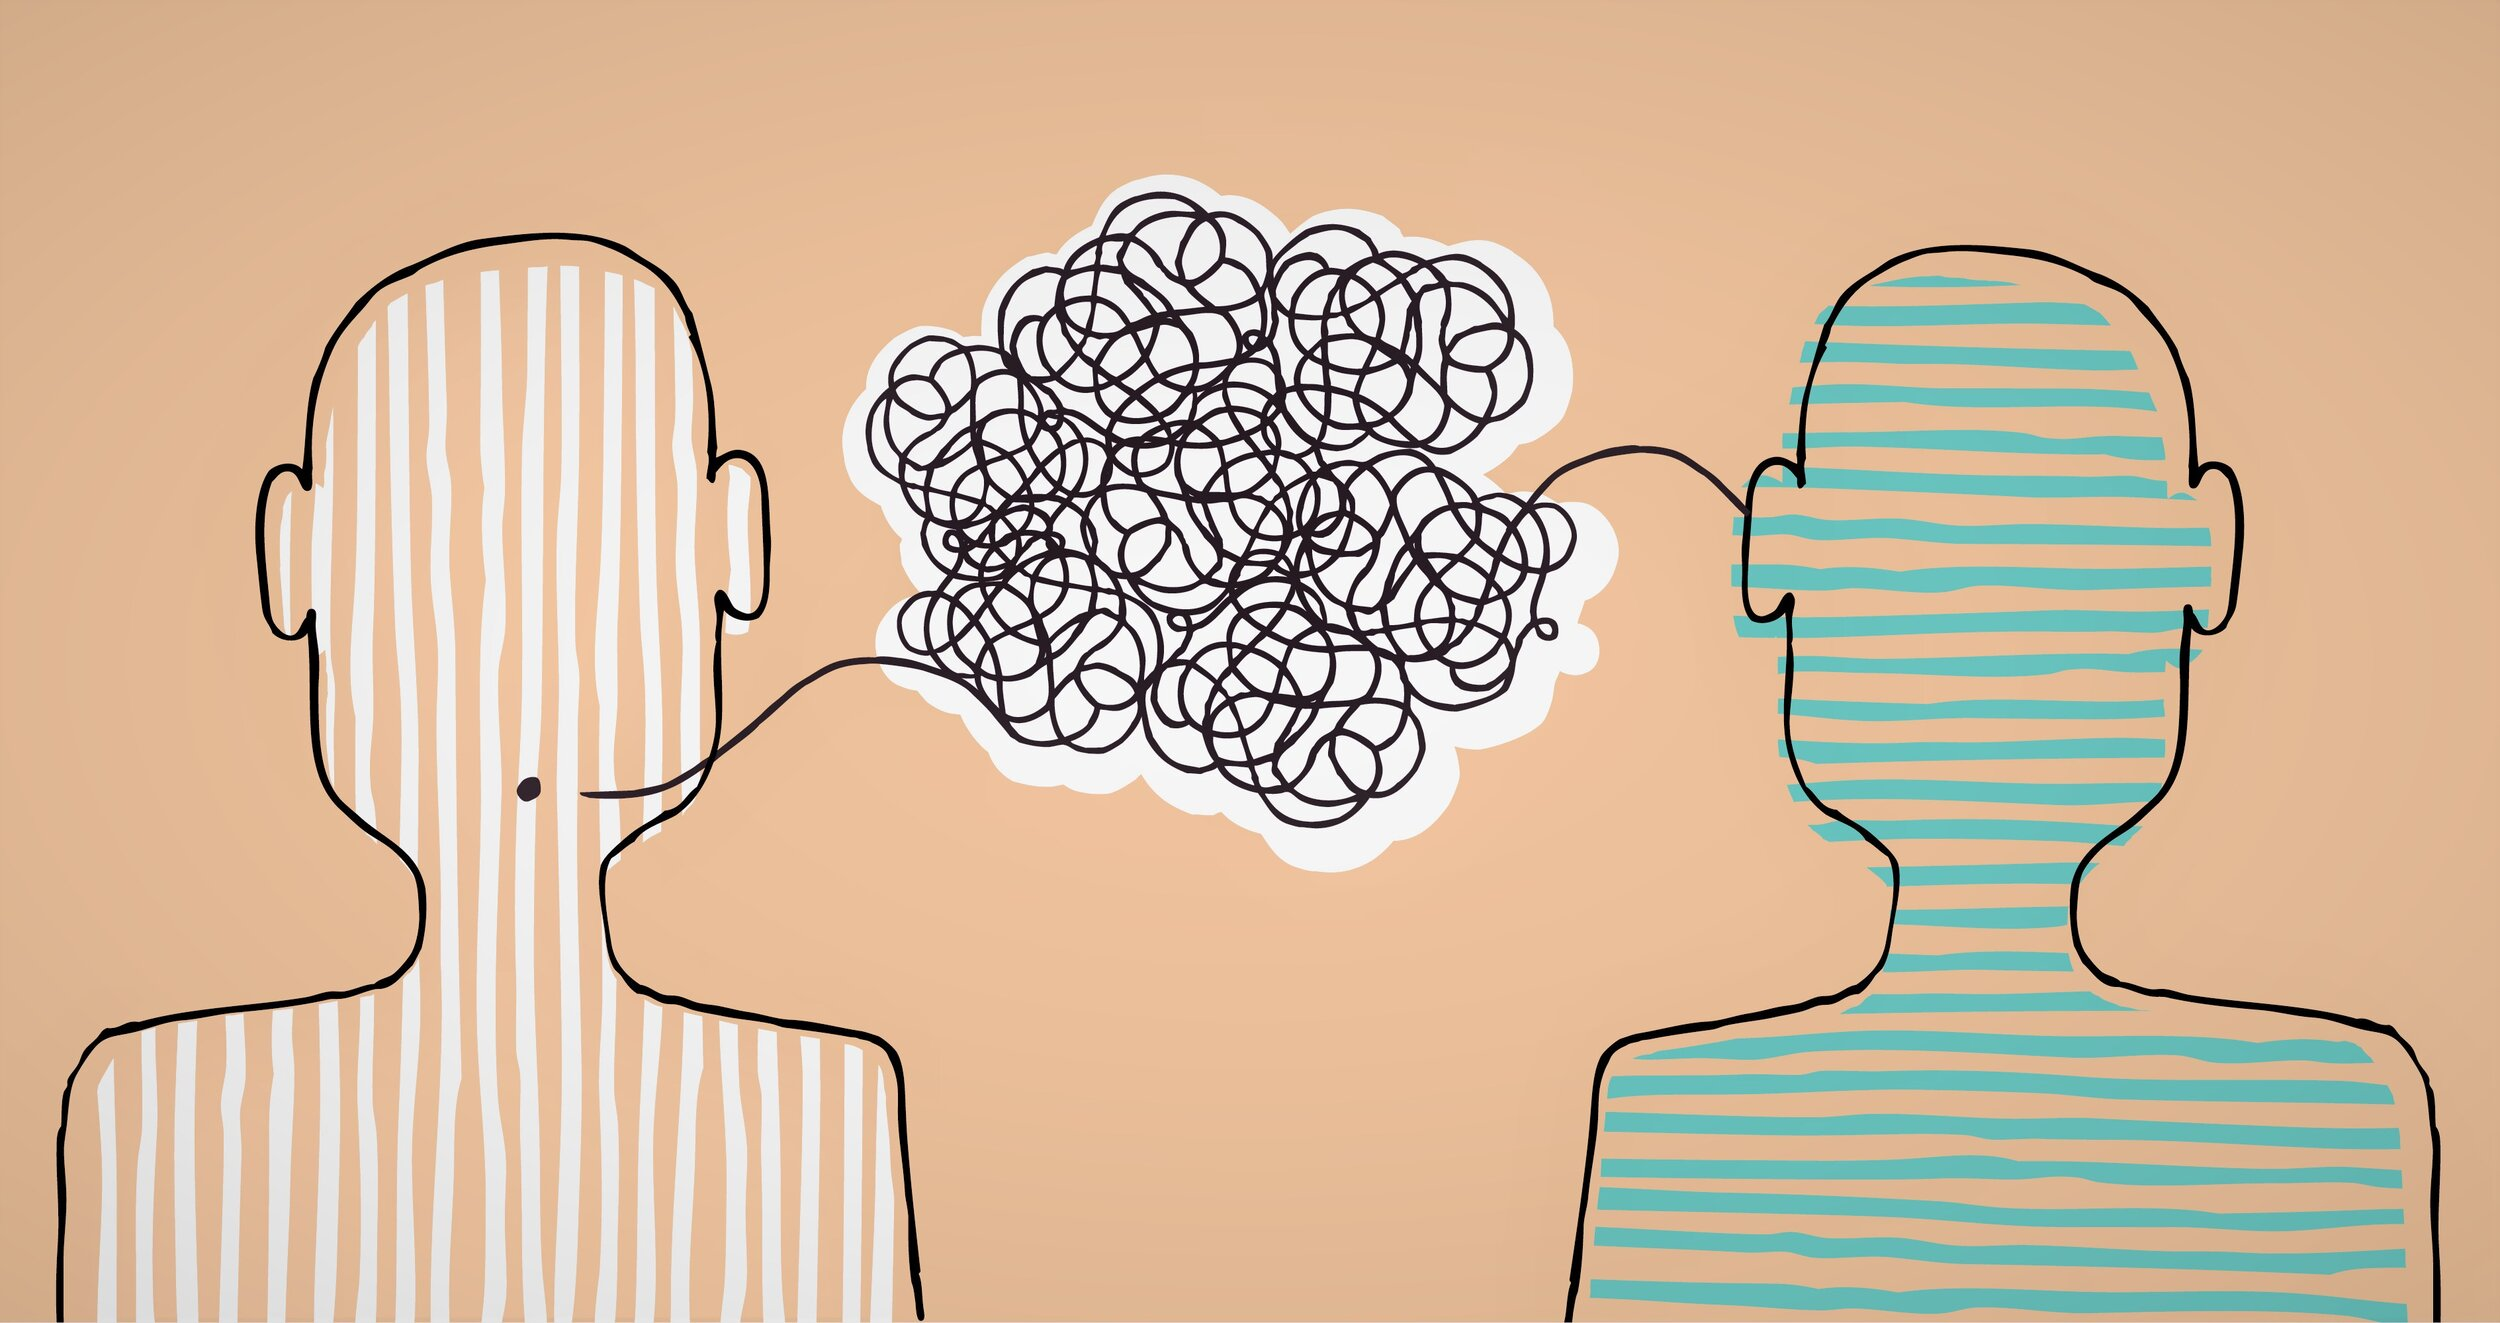 On miscommunication and generational mismatches